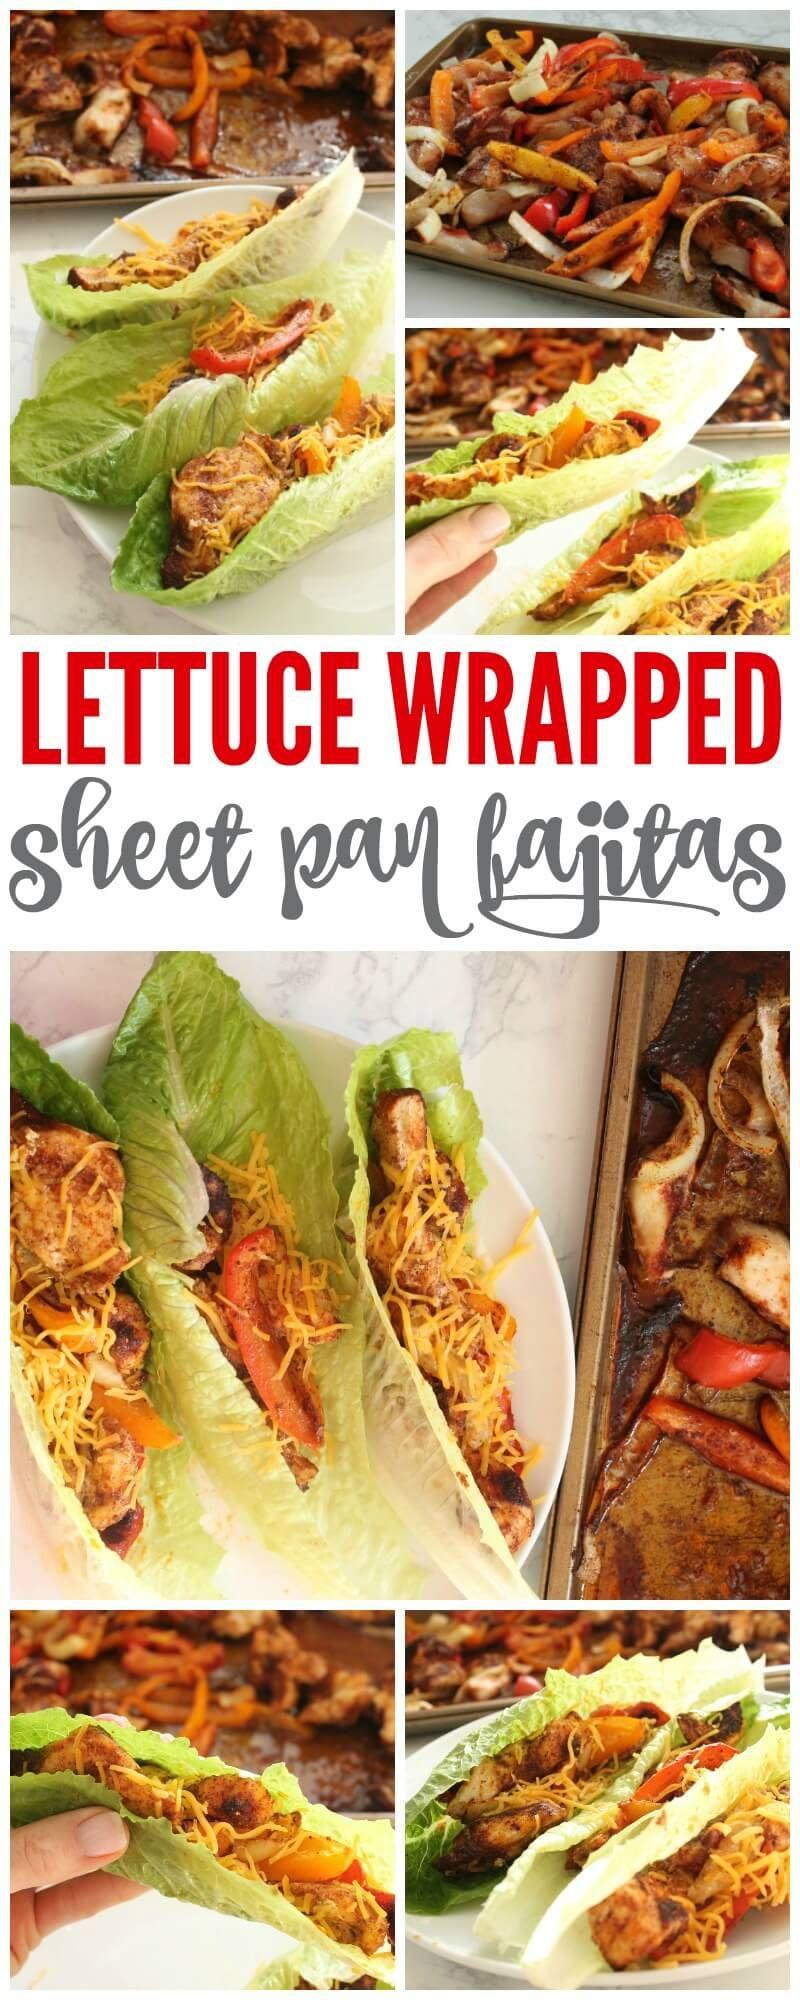 Lettuce Wrapped Sheet Pan Fajitas with Homemade Fajita Seasoning #homemadefajitaseasoning